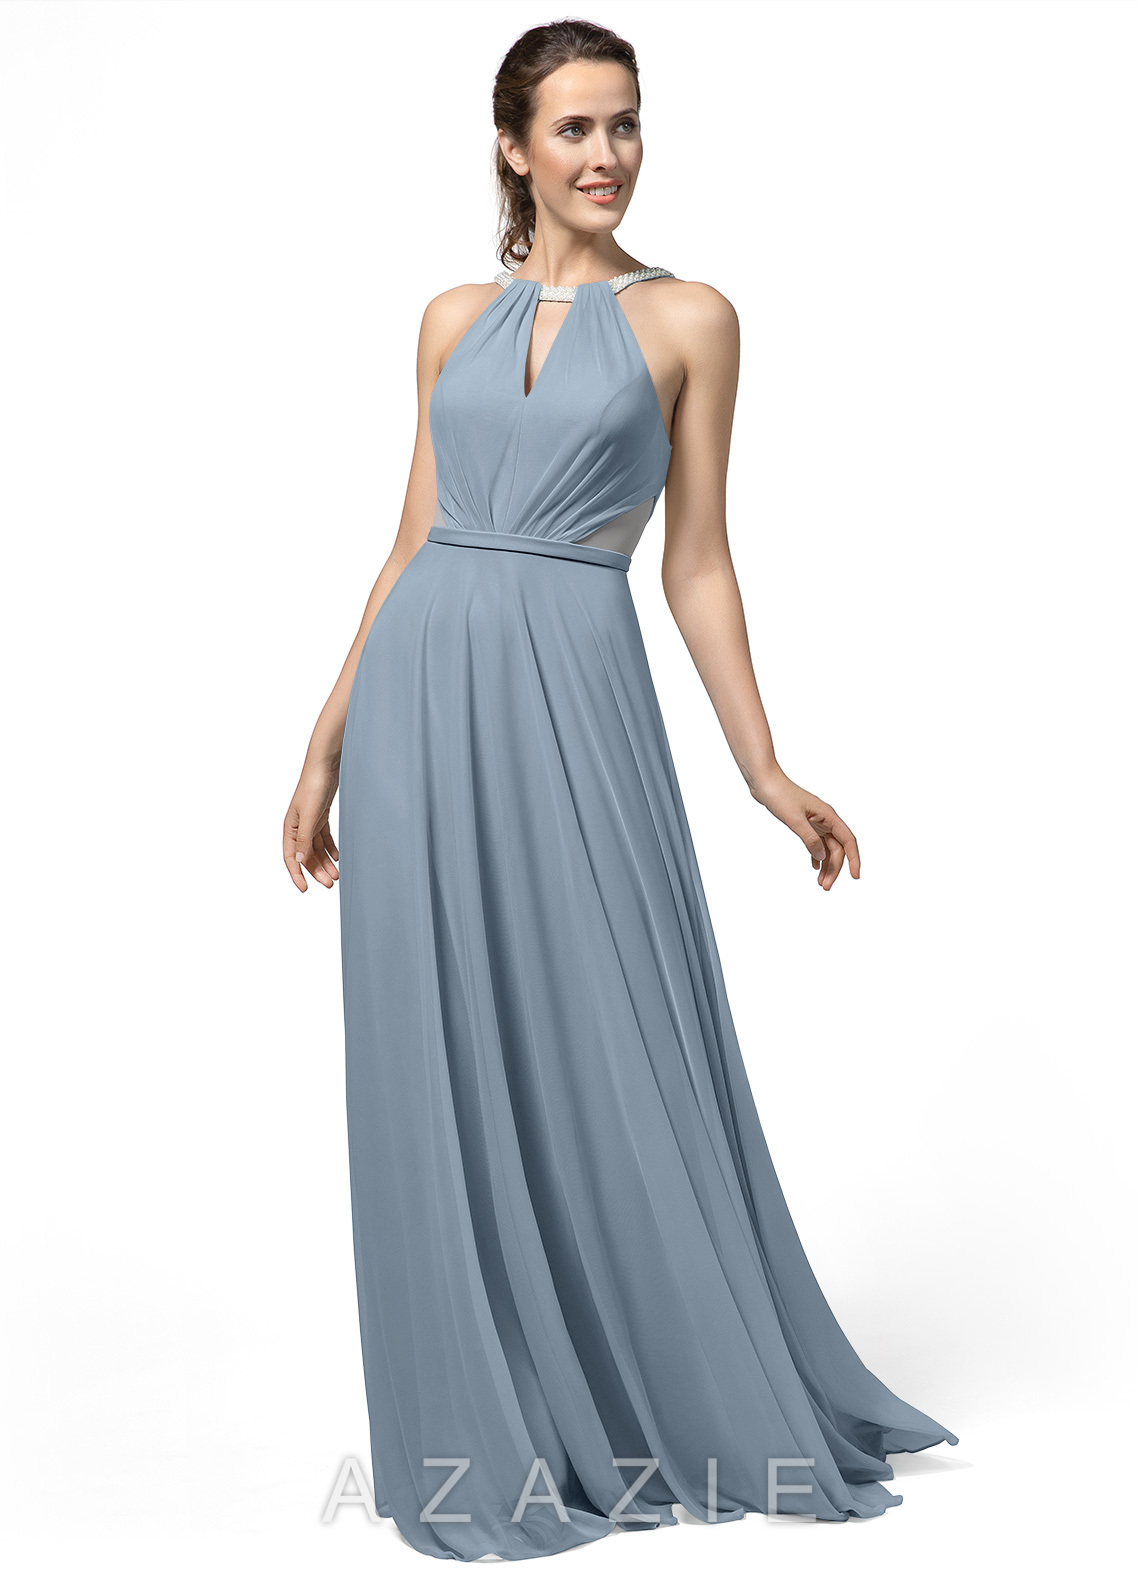 2cb74def415 Bridesmaid Dresses Azazie - Gomes Weine AG